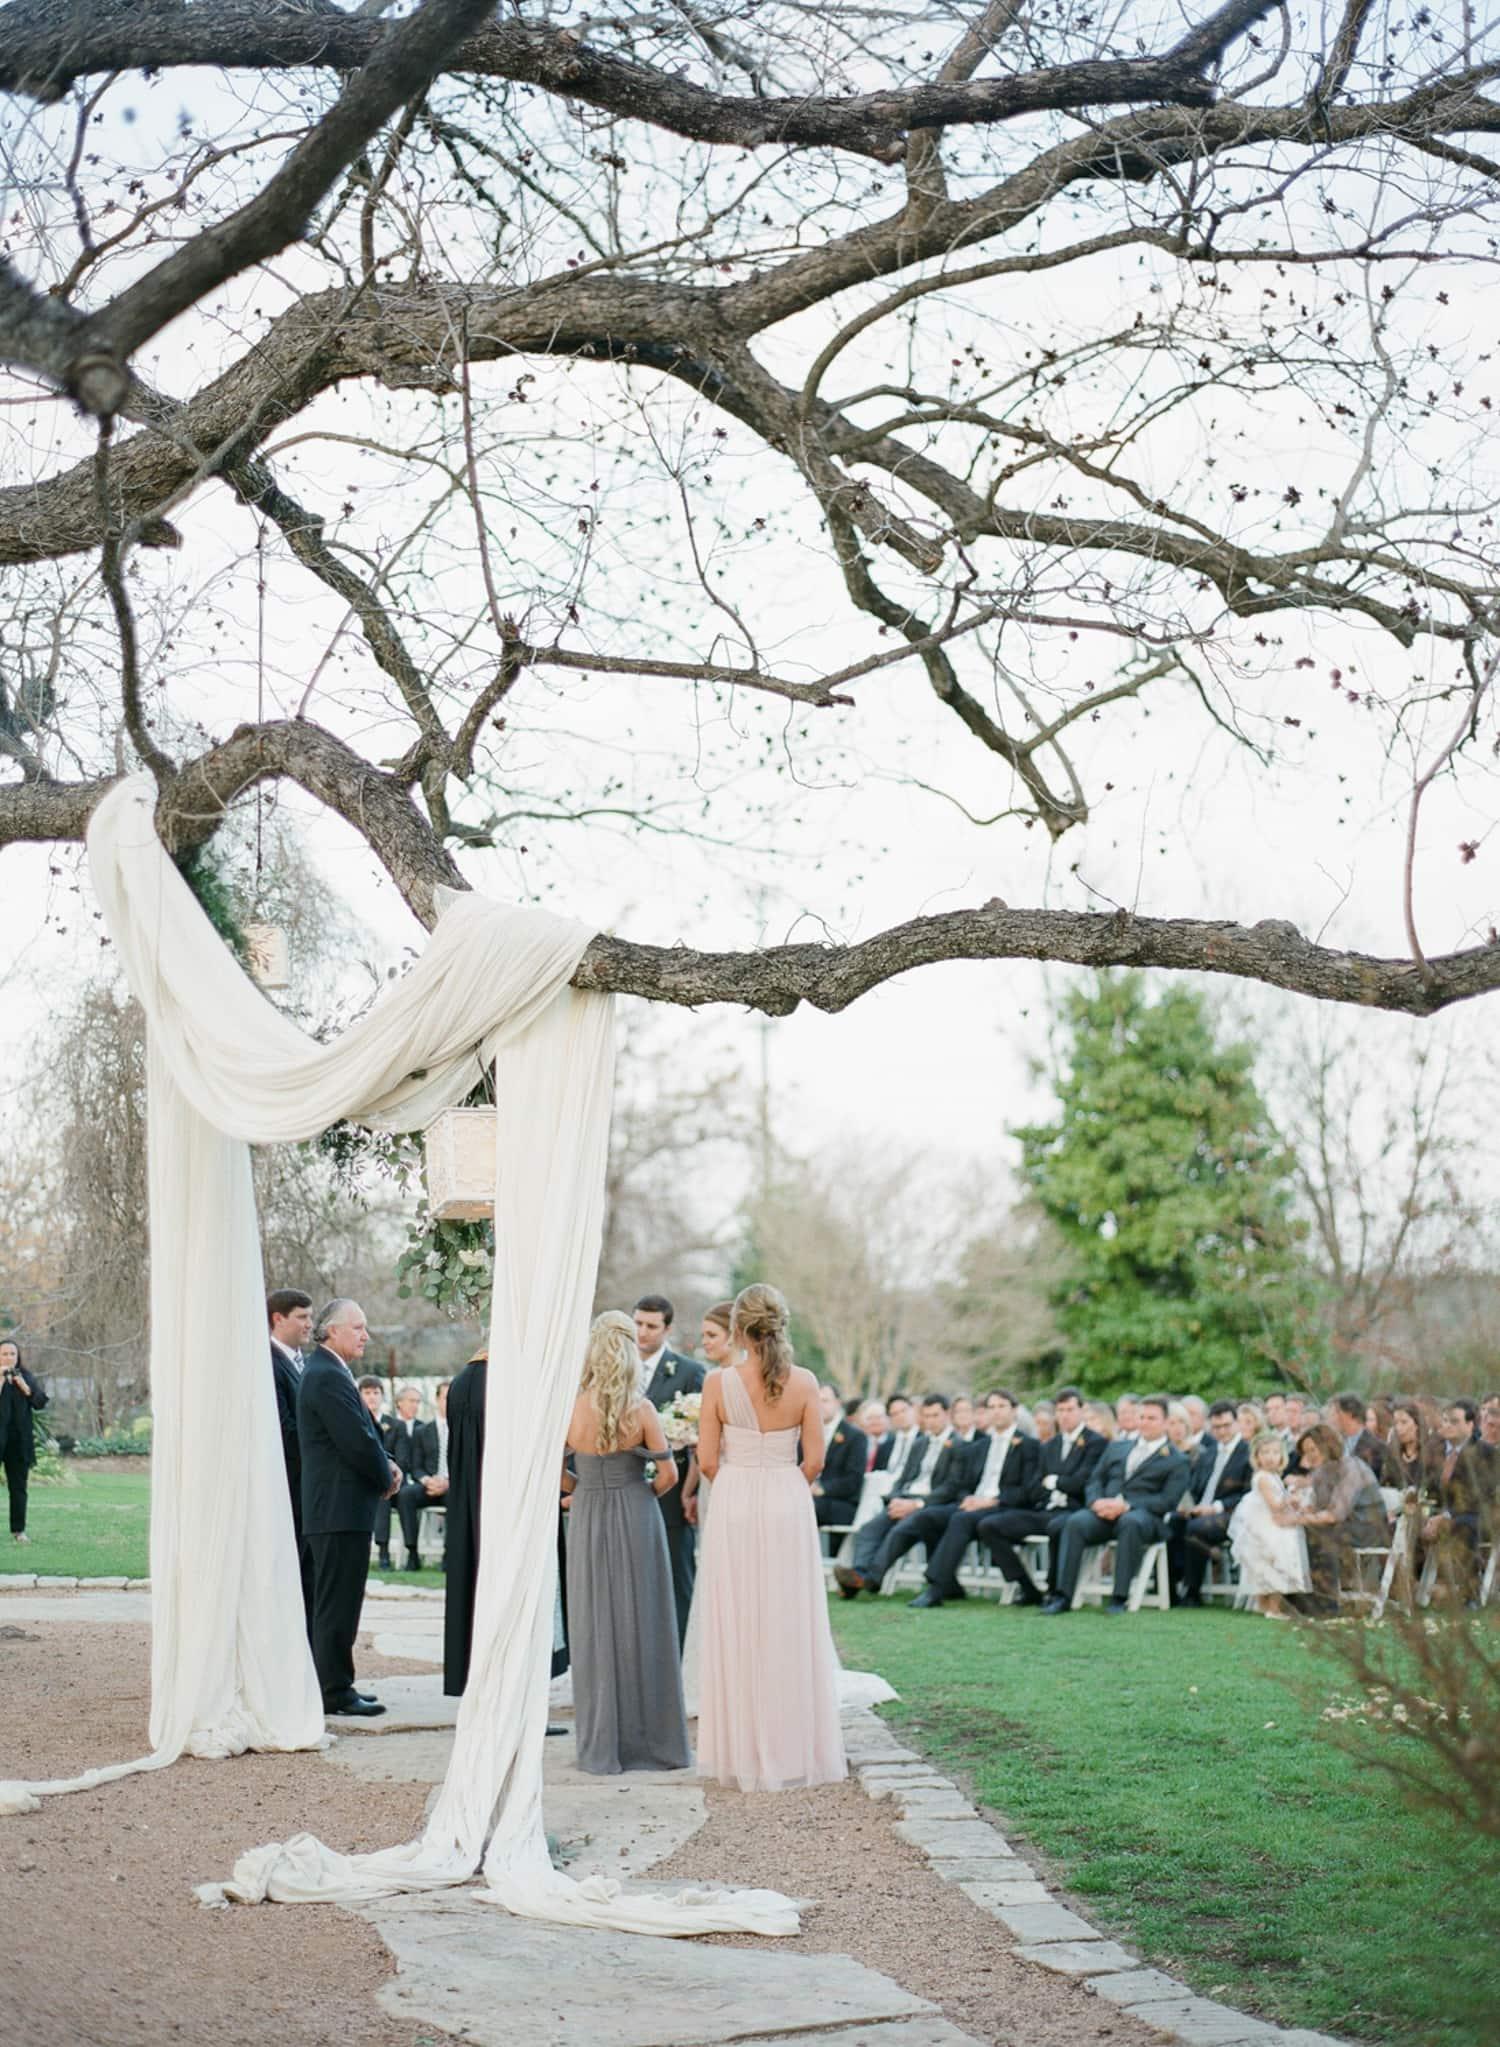 barr-mansion-wedding-29.jpg